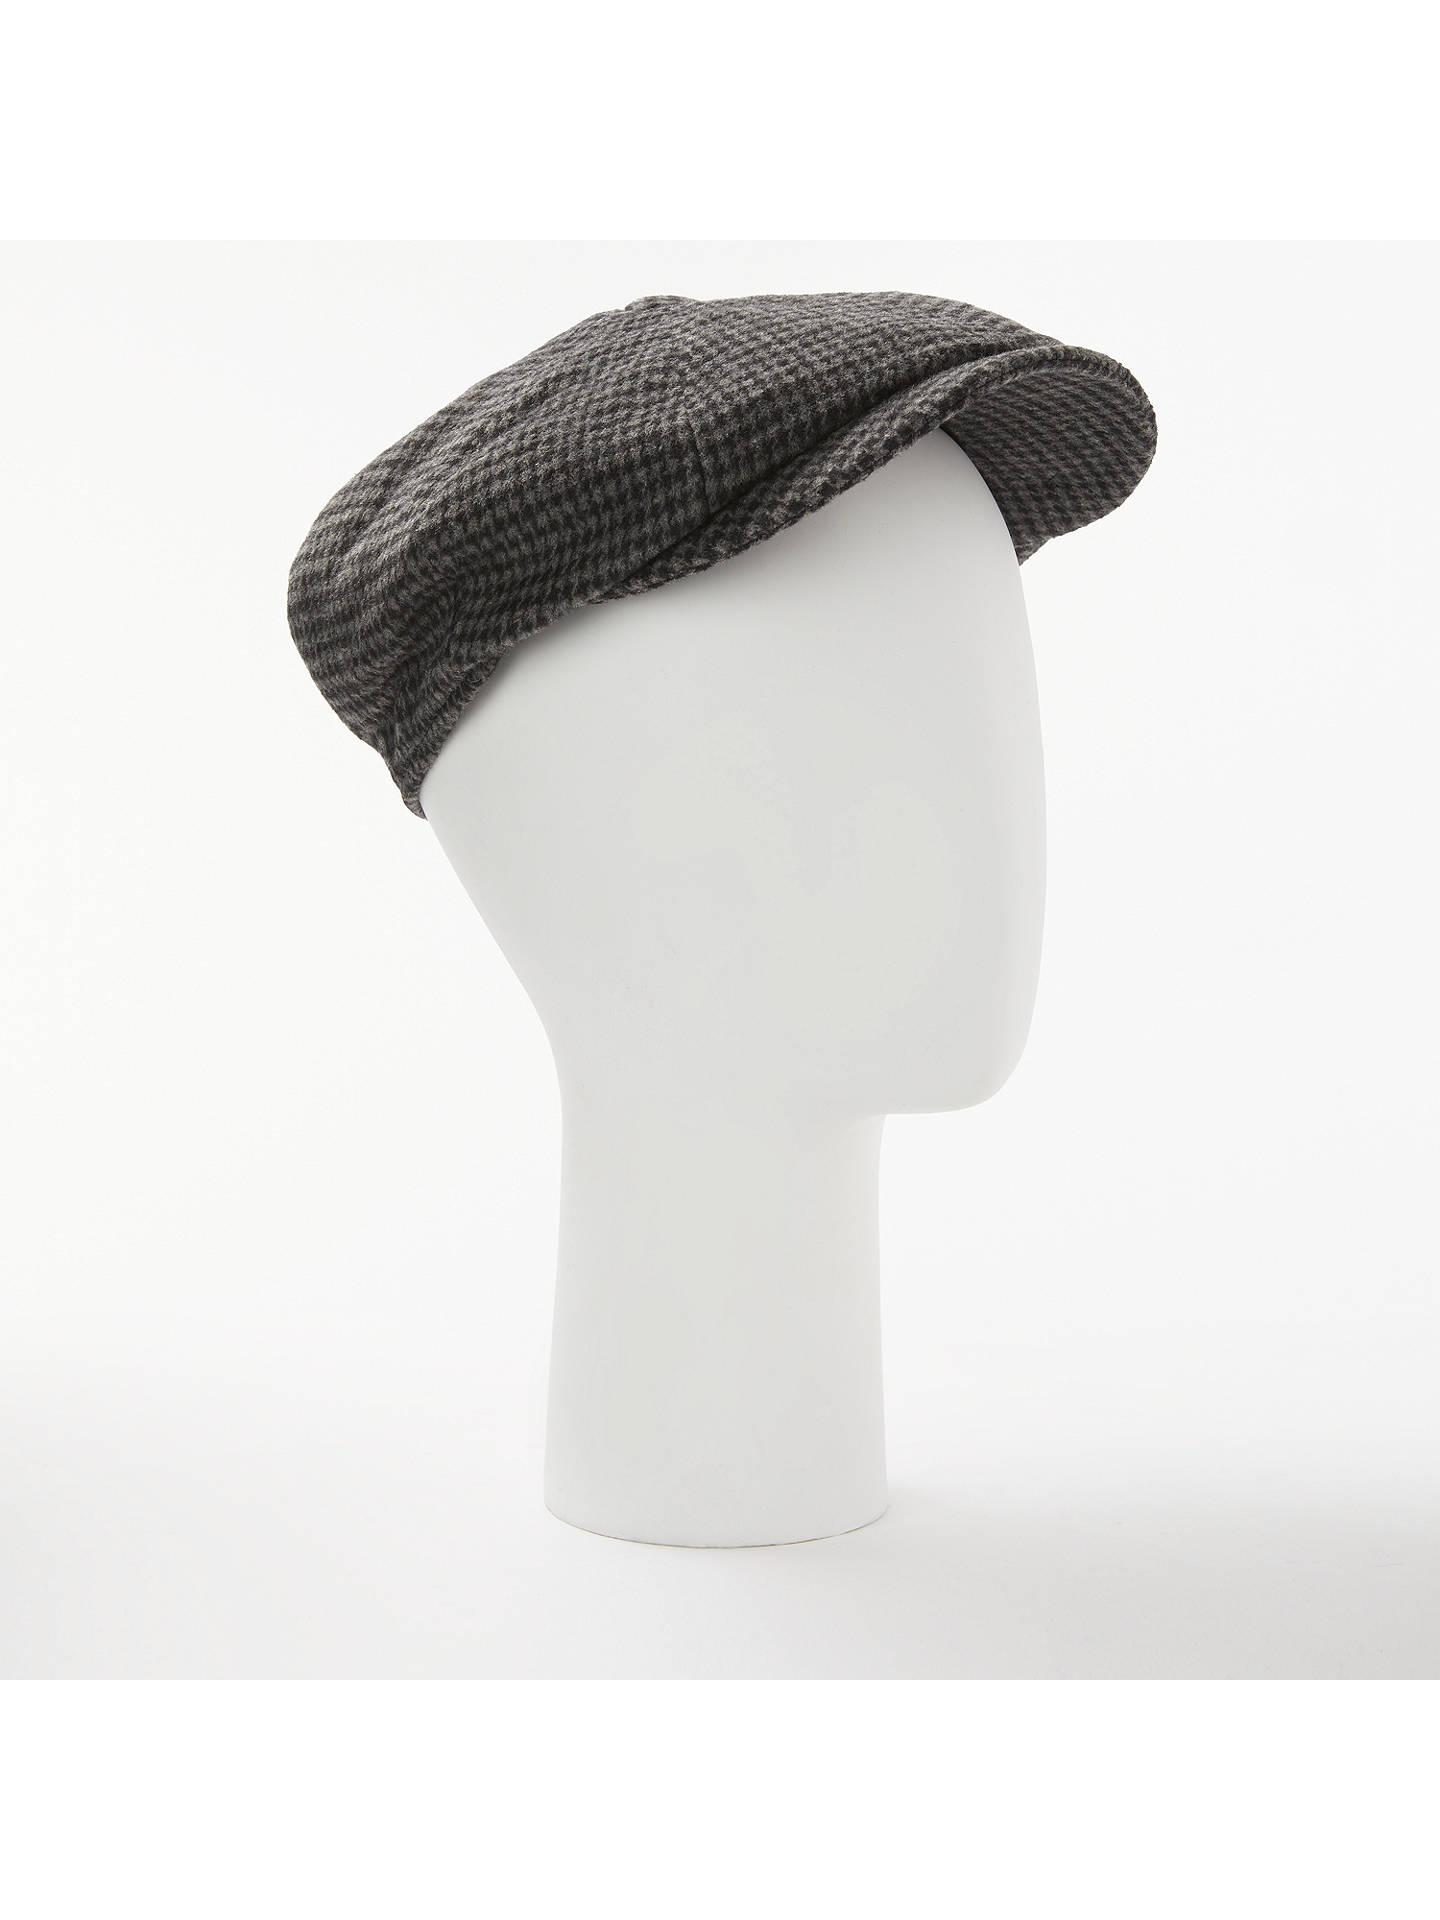 78ae7cc5 Buy John Lewis & Partners Dogtooth Baker Boy Cap, Grey, S/M Online ...